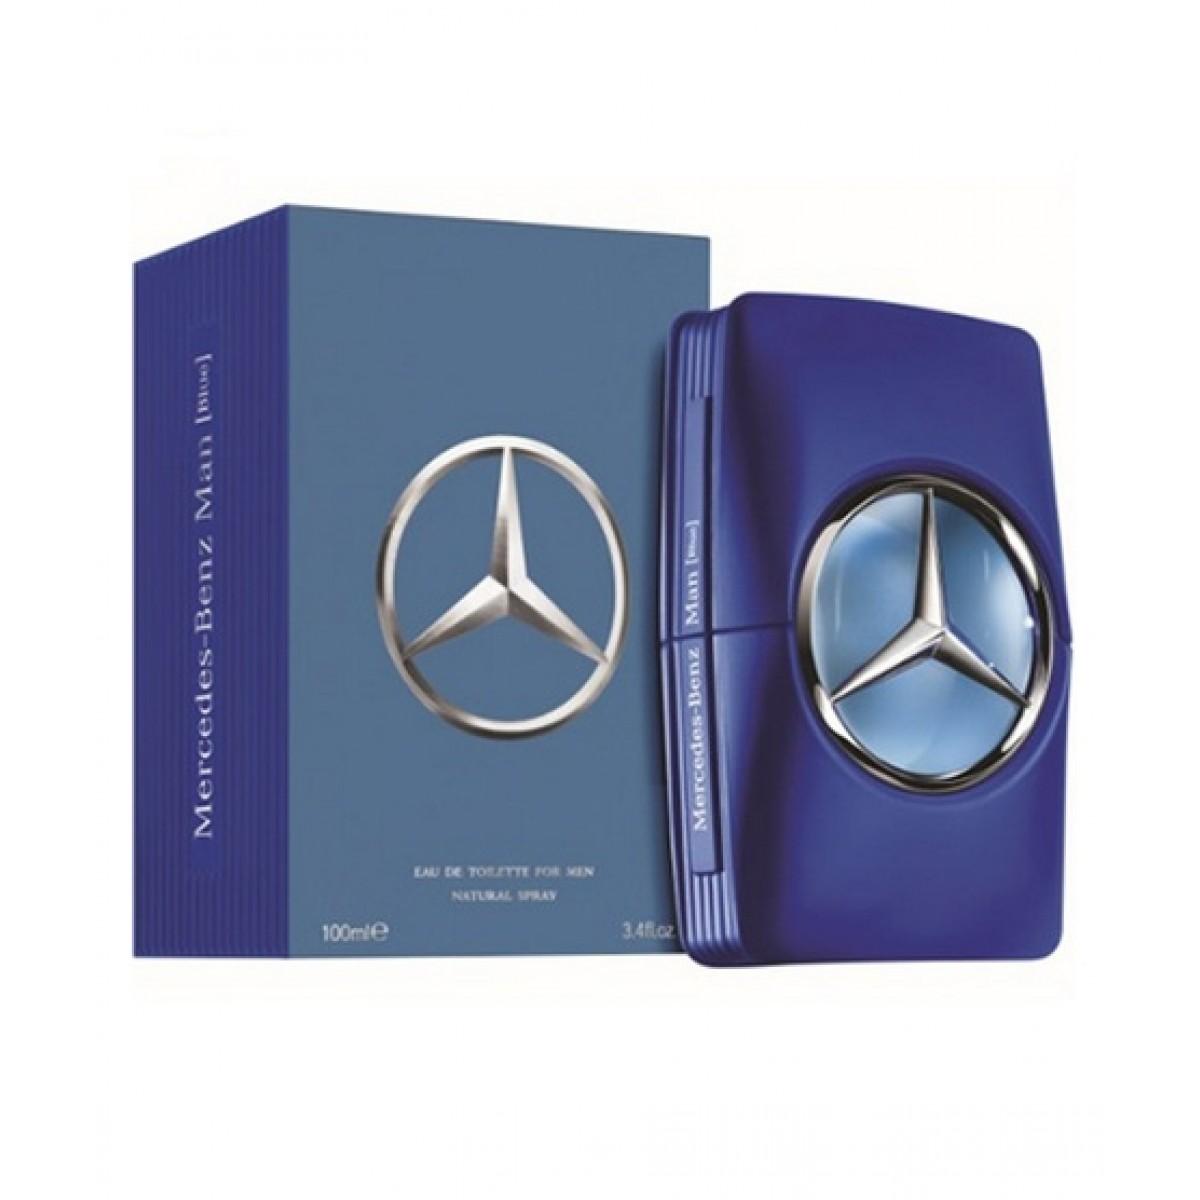 mercedes benz blue edt perfume for men price in pakistan | buy